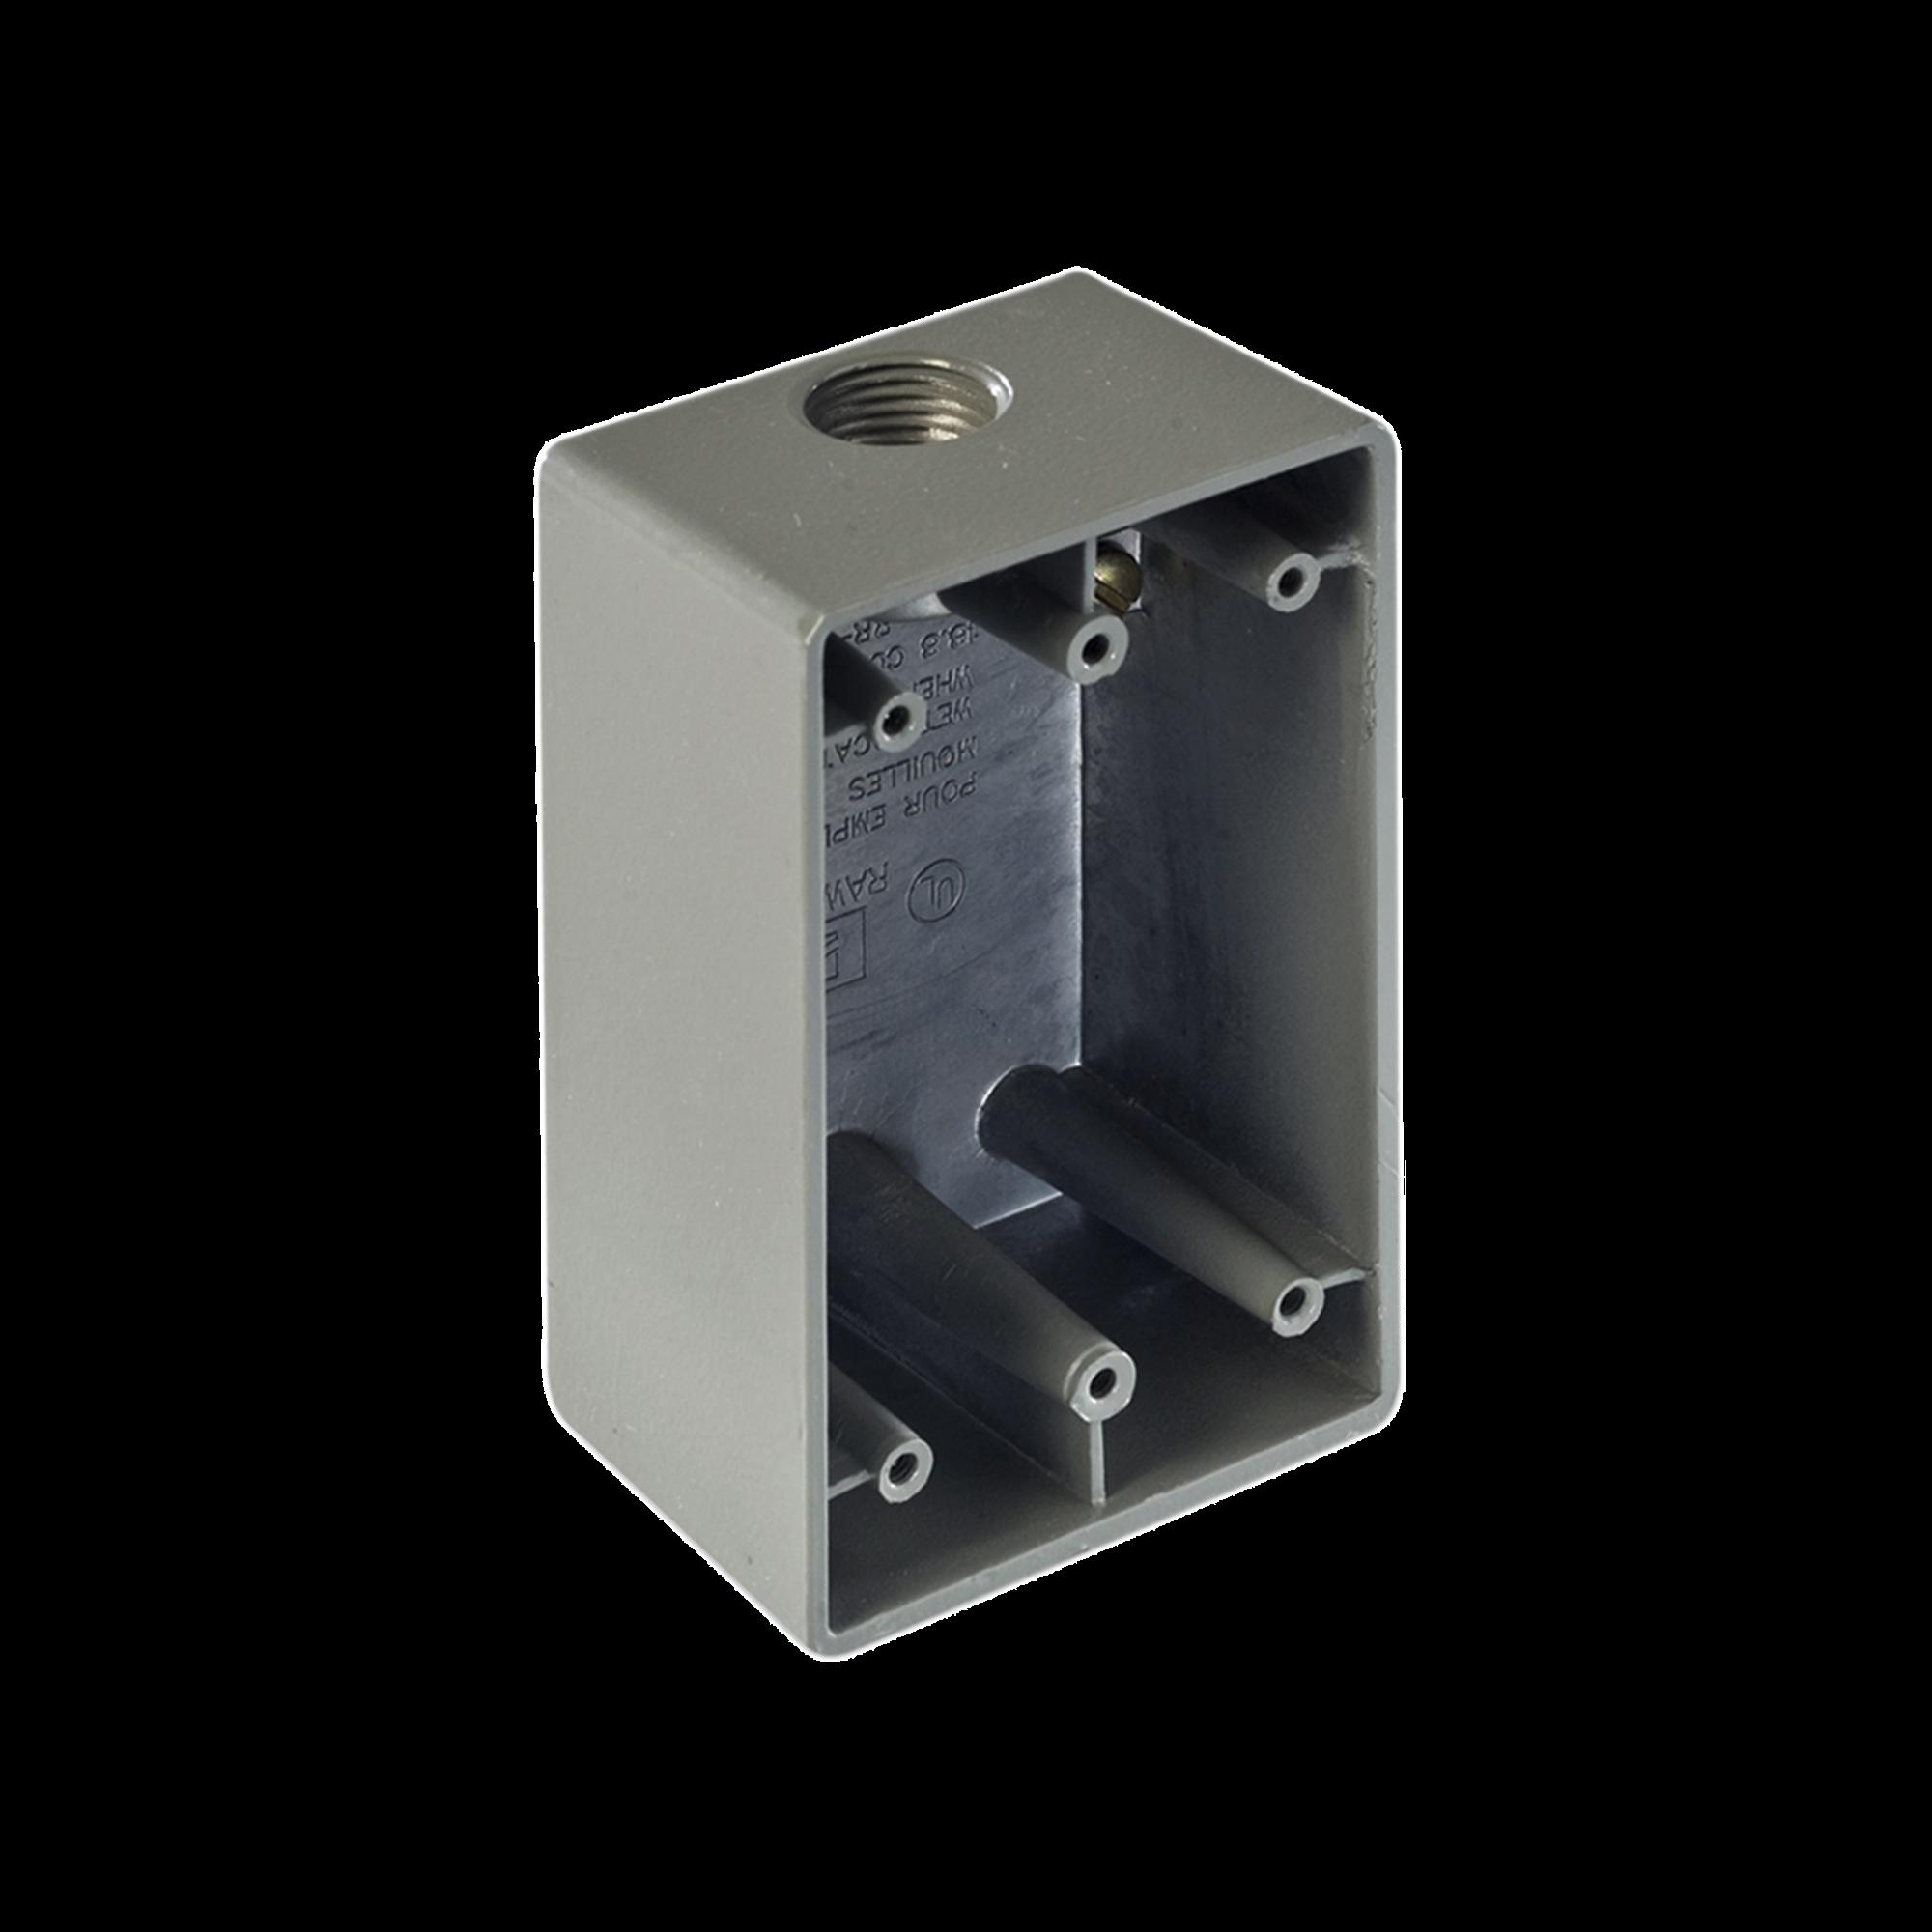 Caja Condulet FS de 1 (25.4 mm) con una boca a prueba de intemperie.